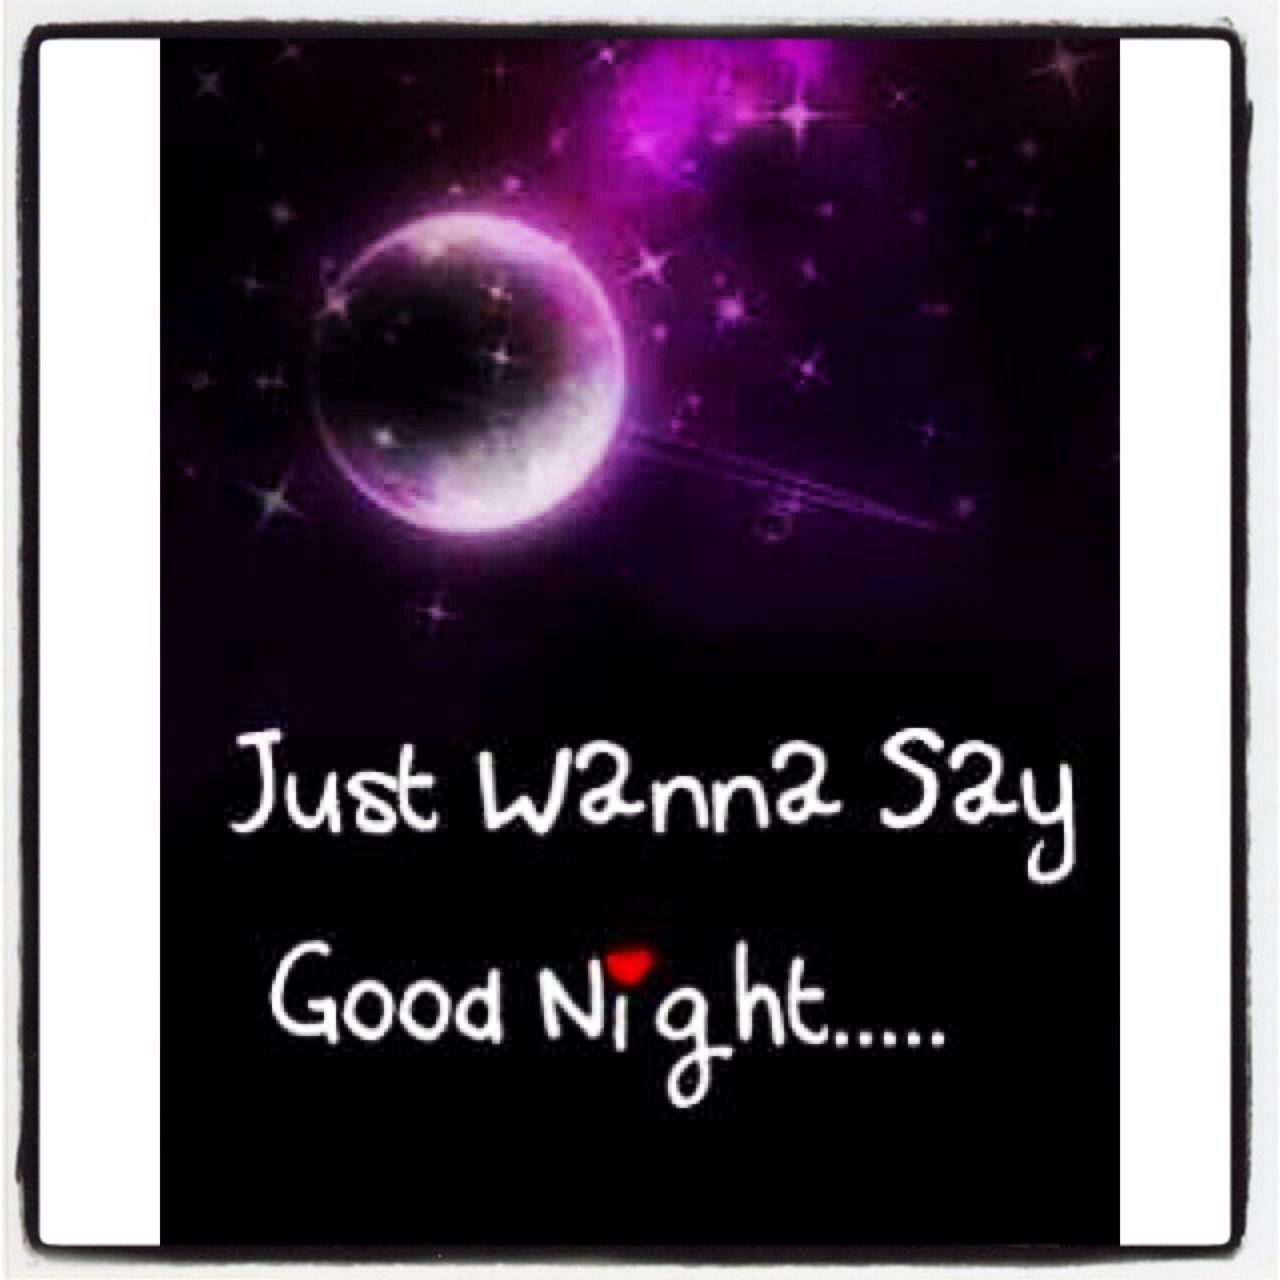 Just Wanna Say G D Night Good Night Quotes Good Night Night Quotes